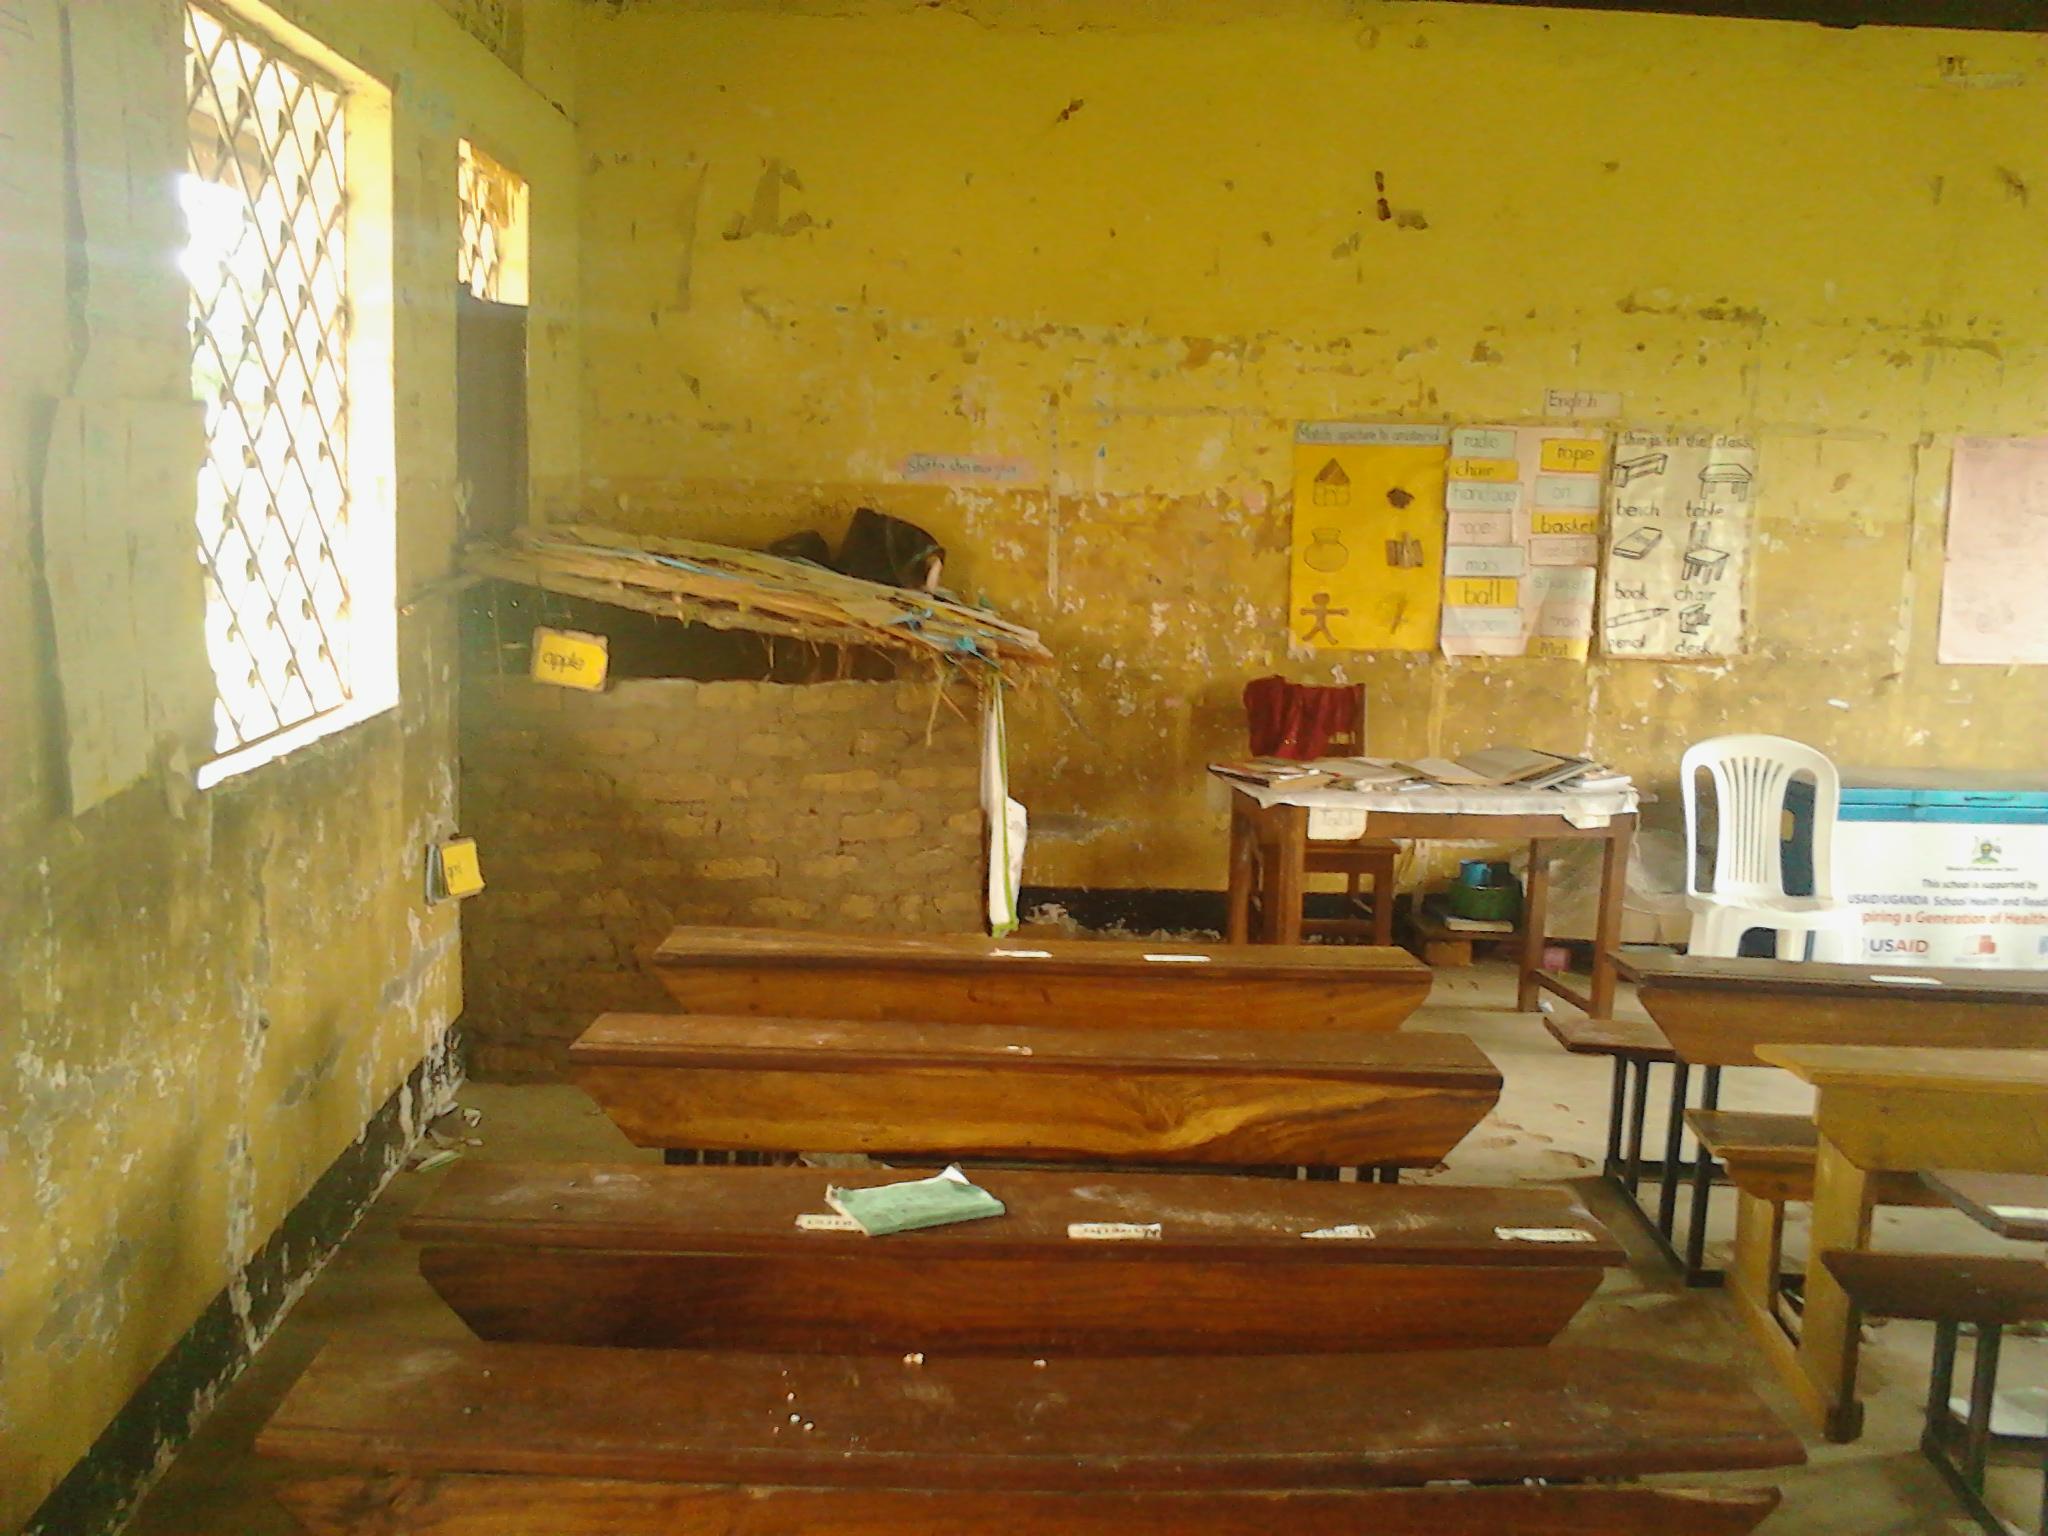 152 Küche für die Bumasikye Schule – Tukolere Wamu e.V.